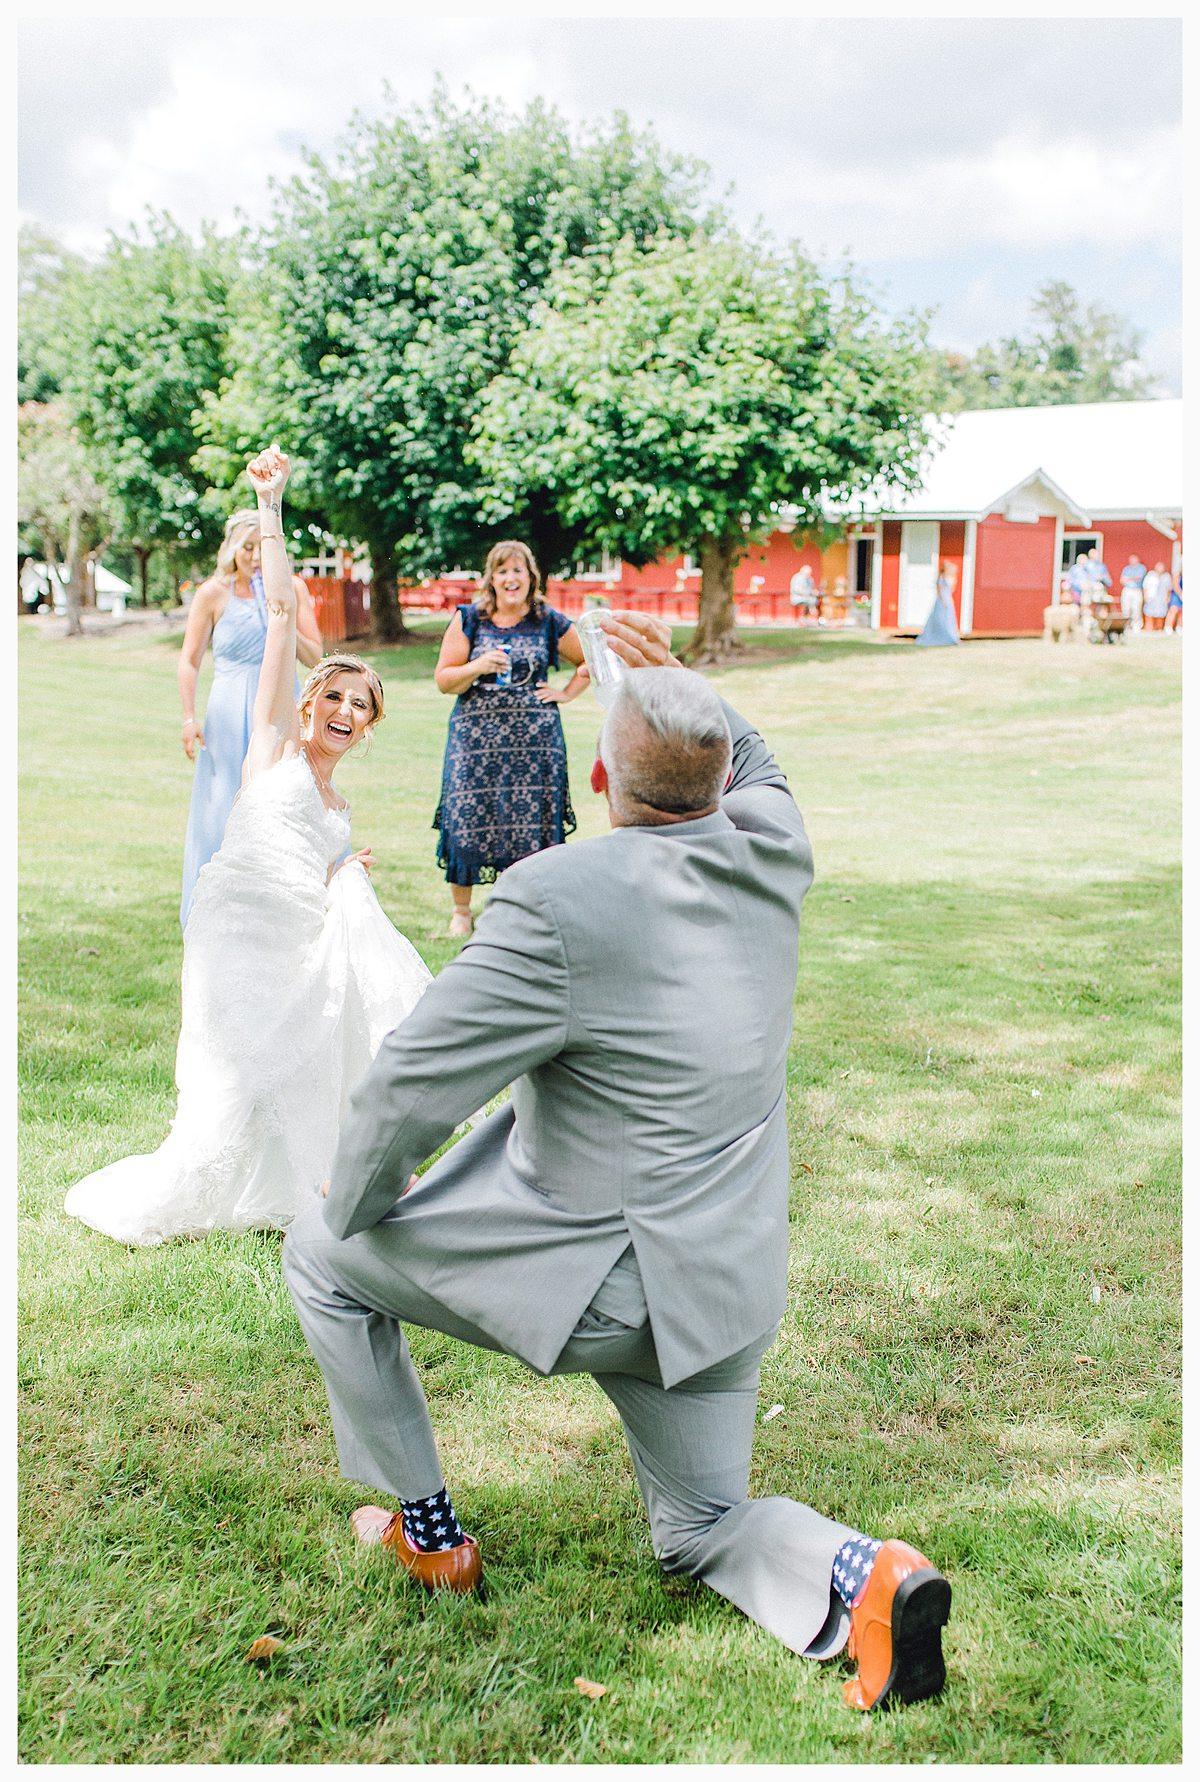 Rustic Coastal Blue Wedding in Southwest Washington, Emma Rose Company, Seattle and Portland Wedding Photographer, Light and Airy_0100.jpg